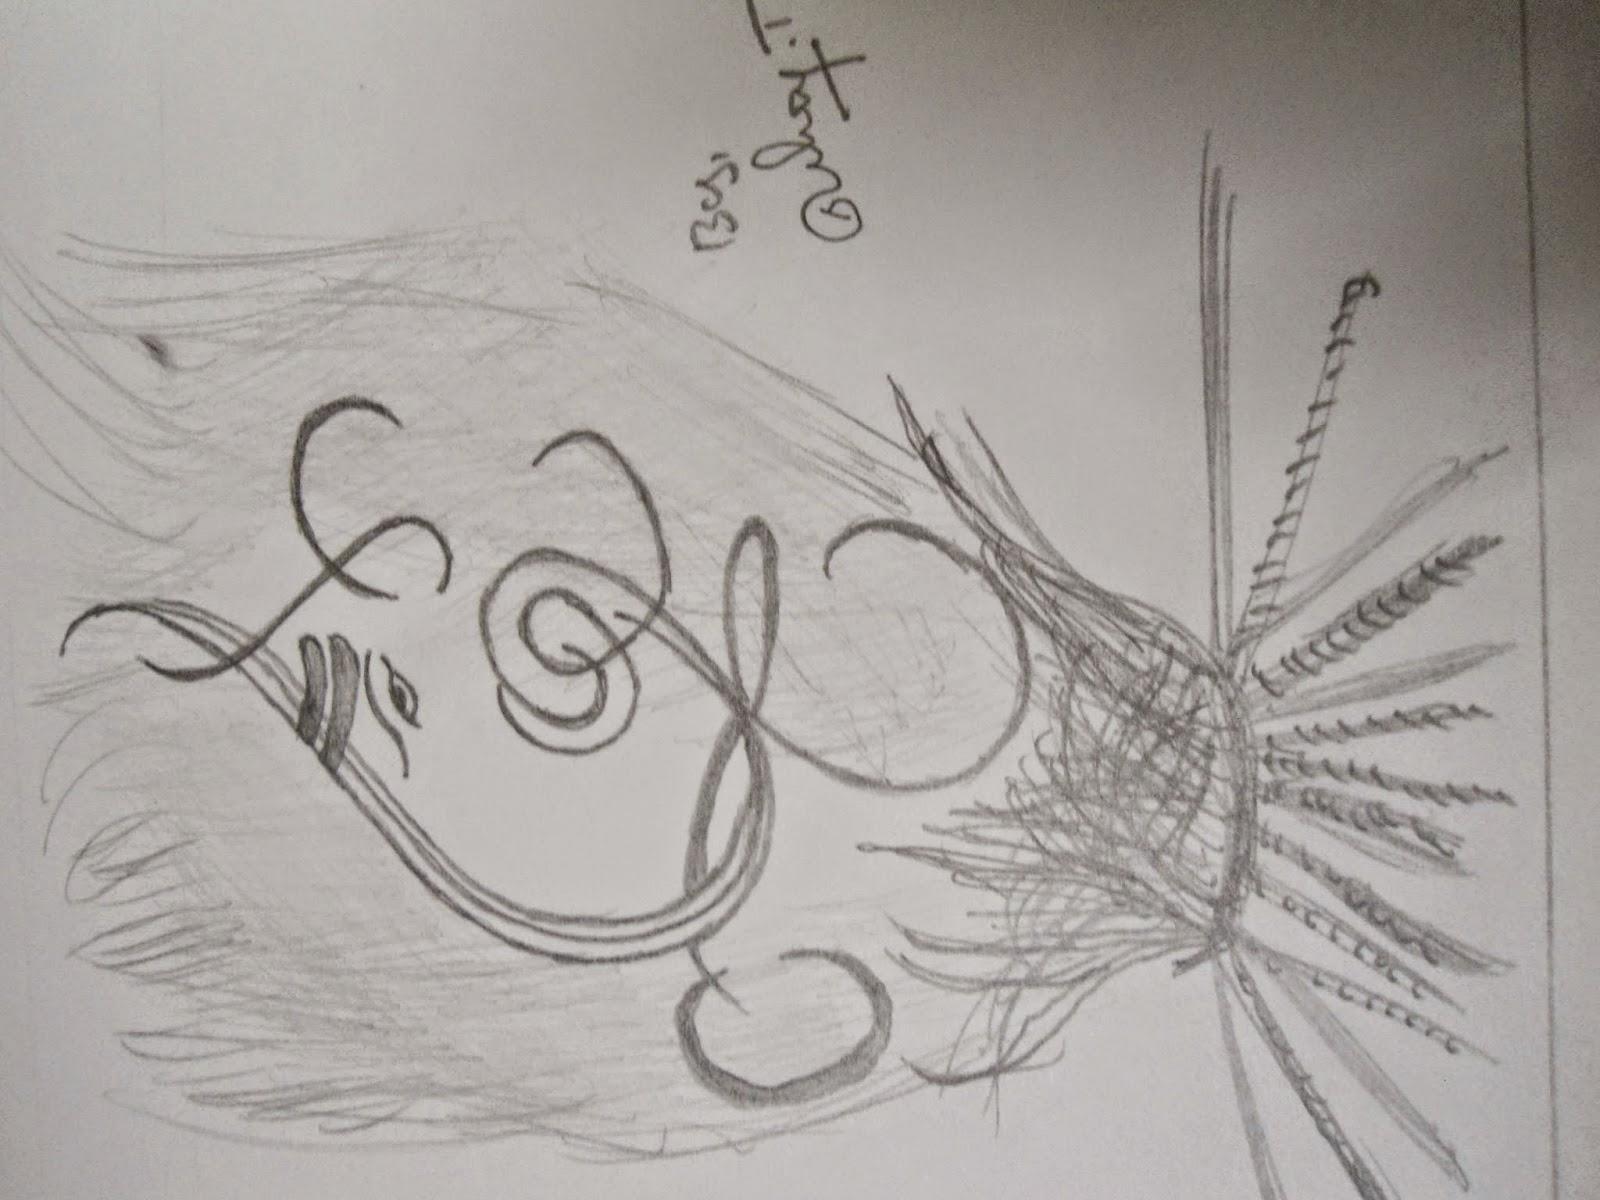 Some more pencil drawings and pencil sketching images of lord ganapathi ganesha ganapathy